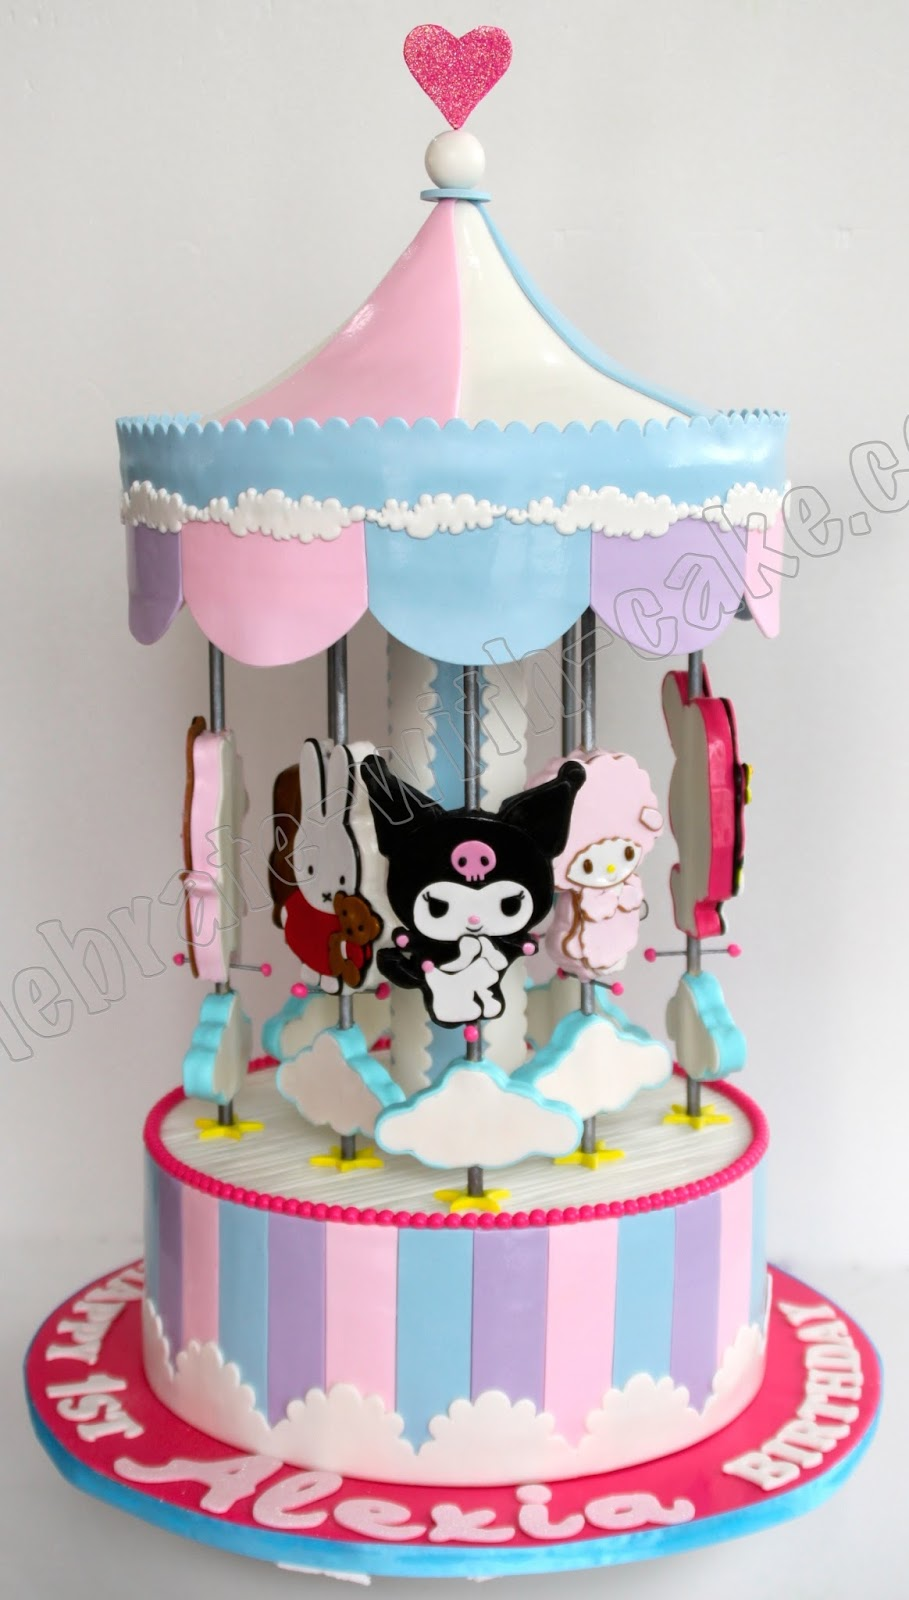 Celebrate with Cake Cartoon Characters Static Carousel Cake